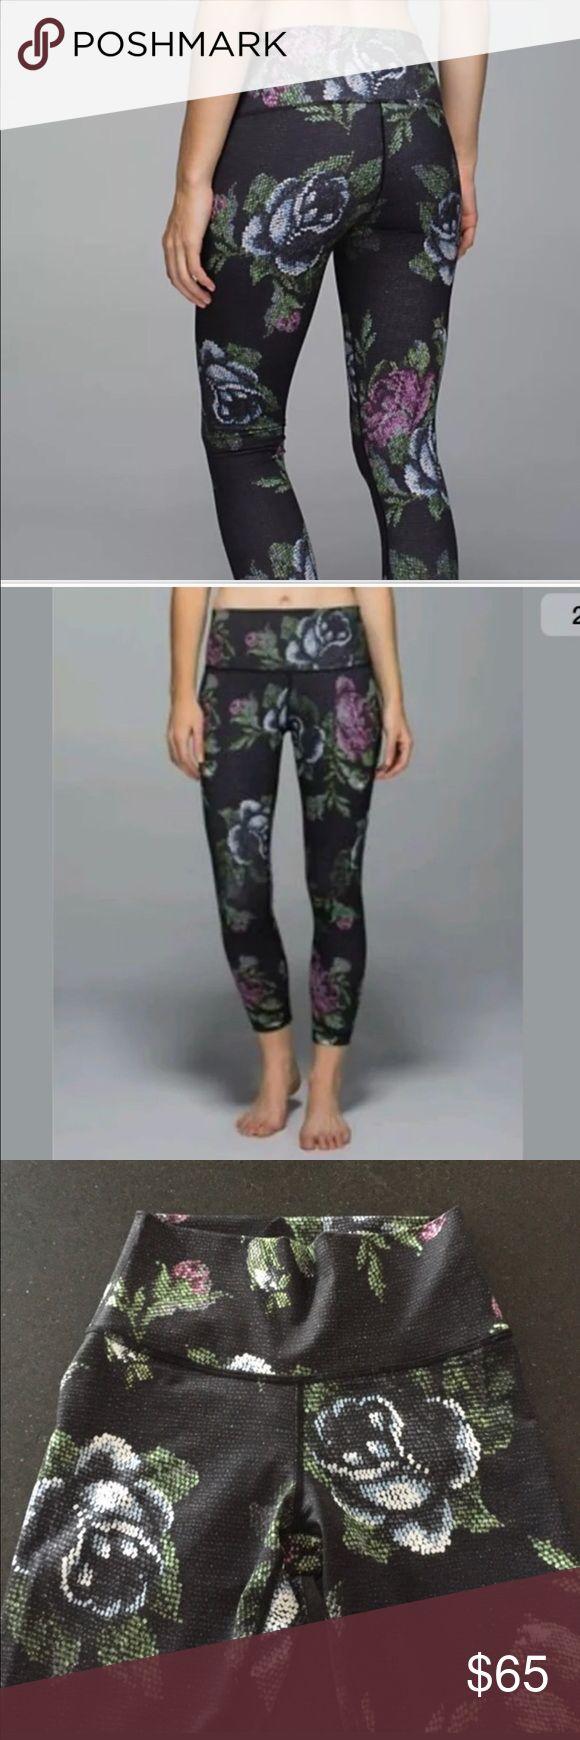 Floral print lululemon leggings Floral print lululemon leggings lululemon athletica Pants Leggings